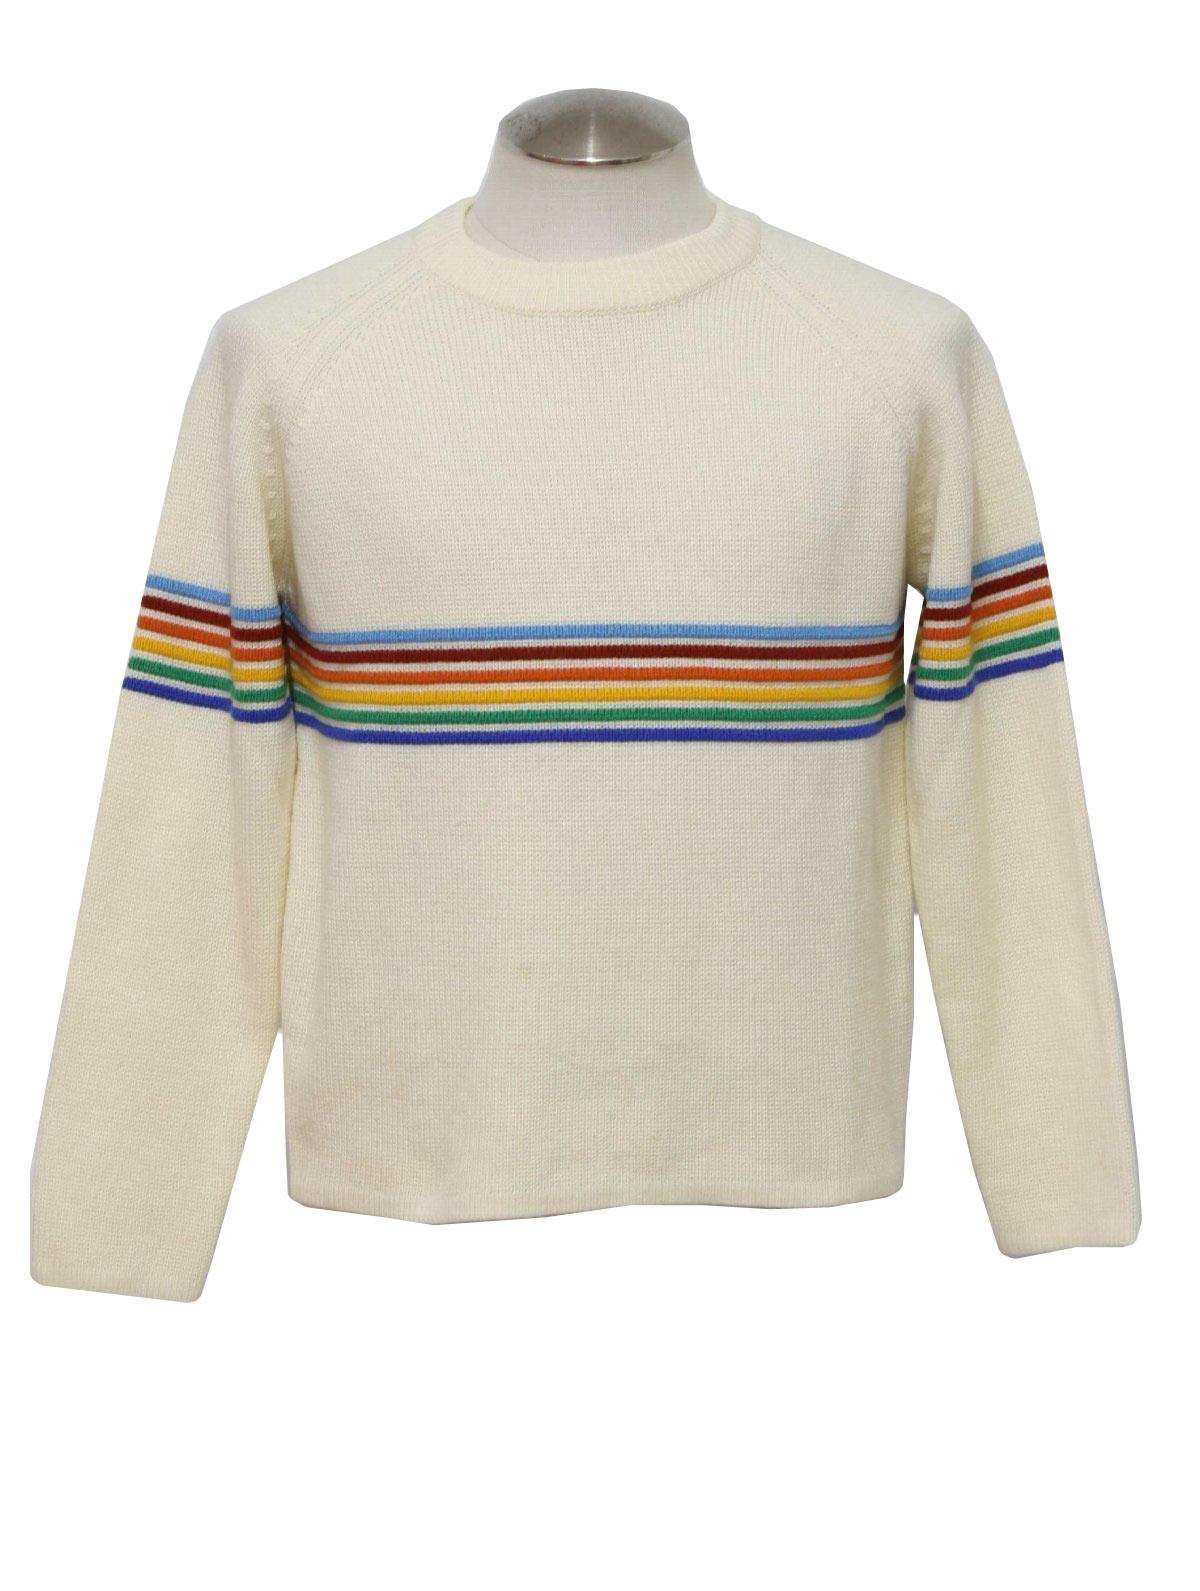 Retro 1970s Sweater: 70s -Stilton- Mens off white, blue, red ...